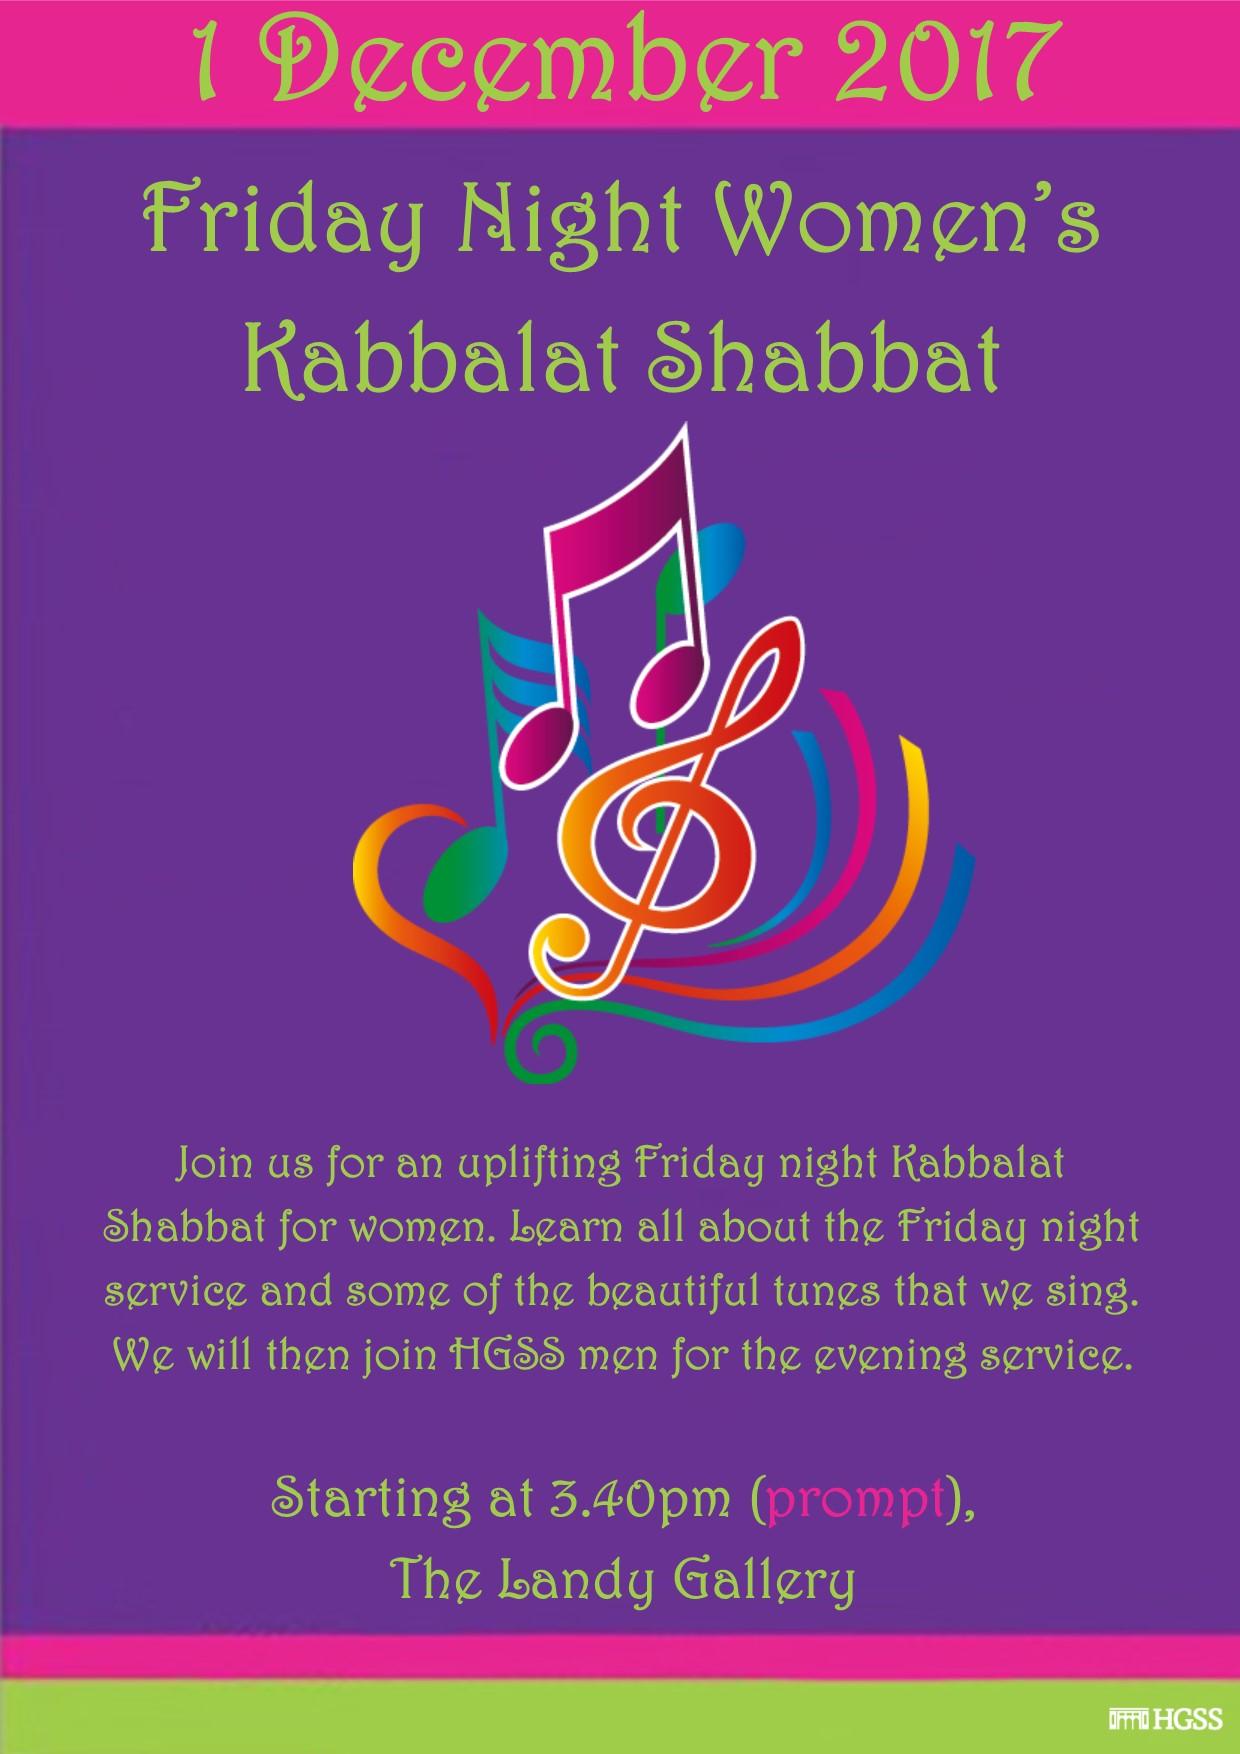 Friday Night Kabbalat Shabbat @ The Landy Gallery